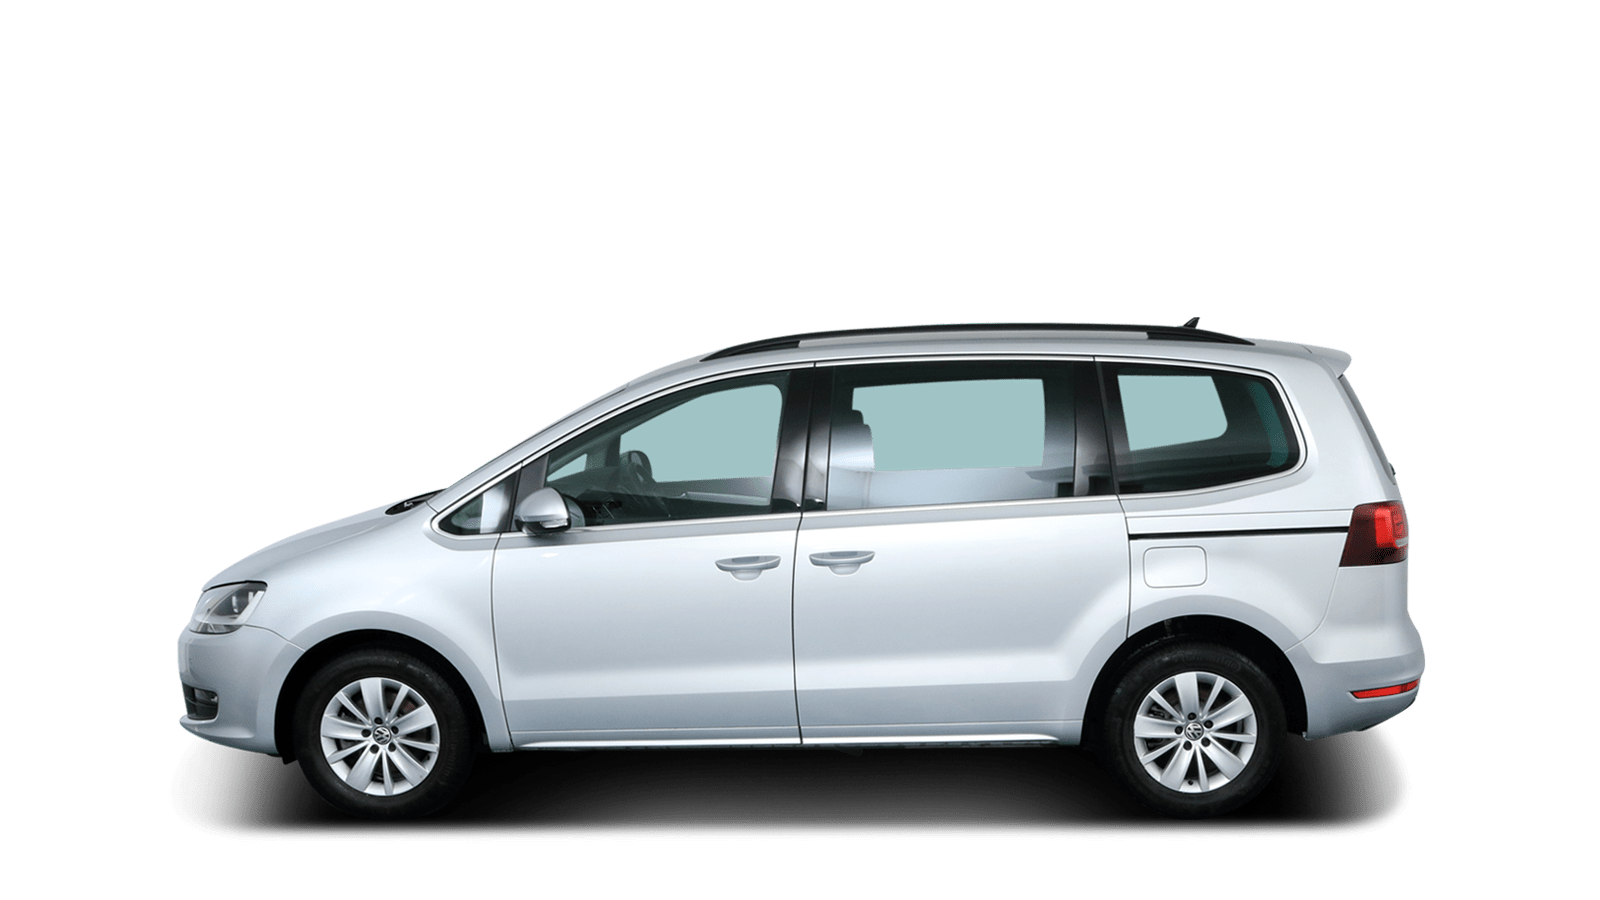 VW Sharan Silver back - Clyde car subscription